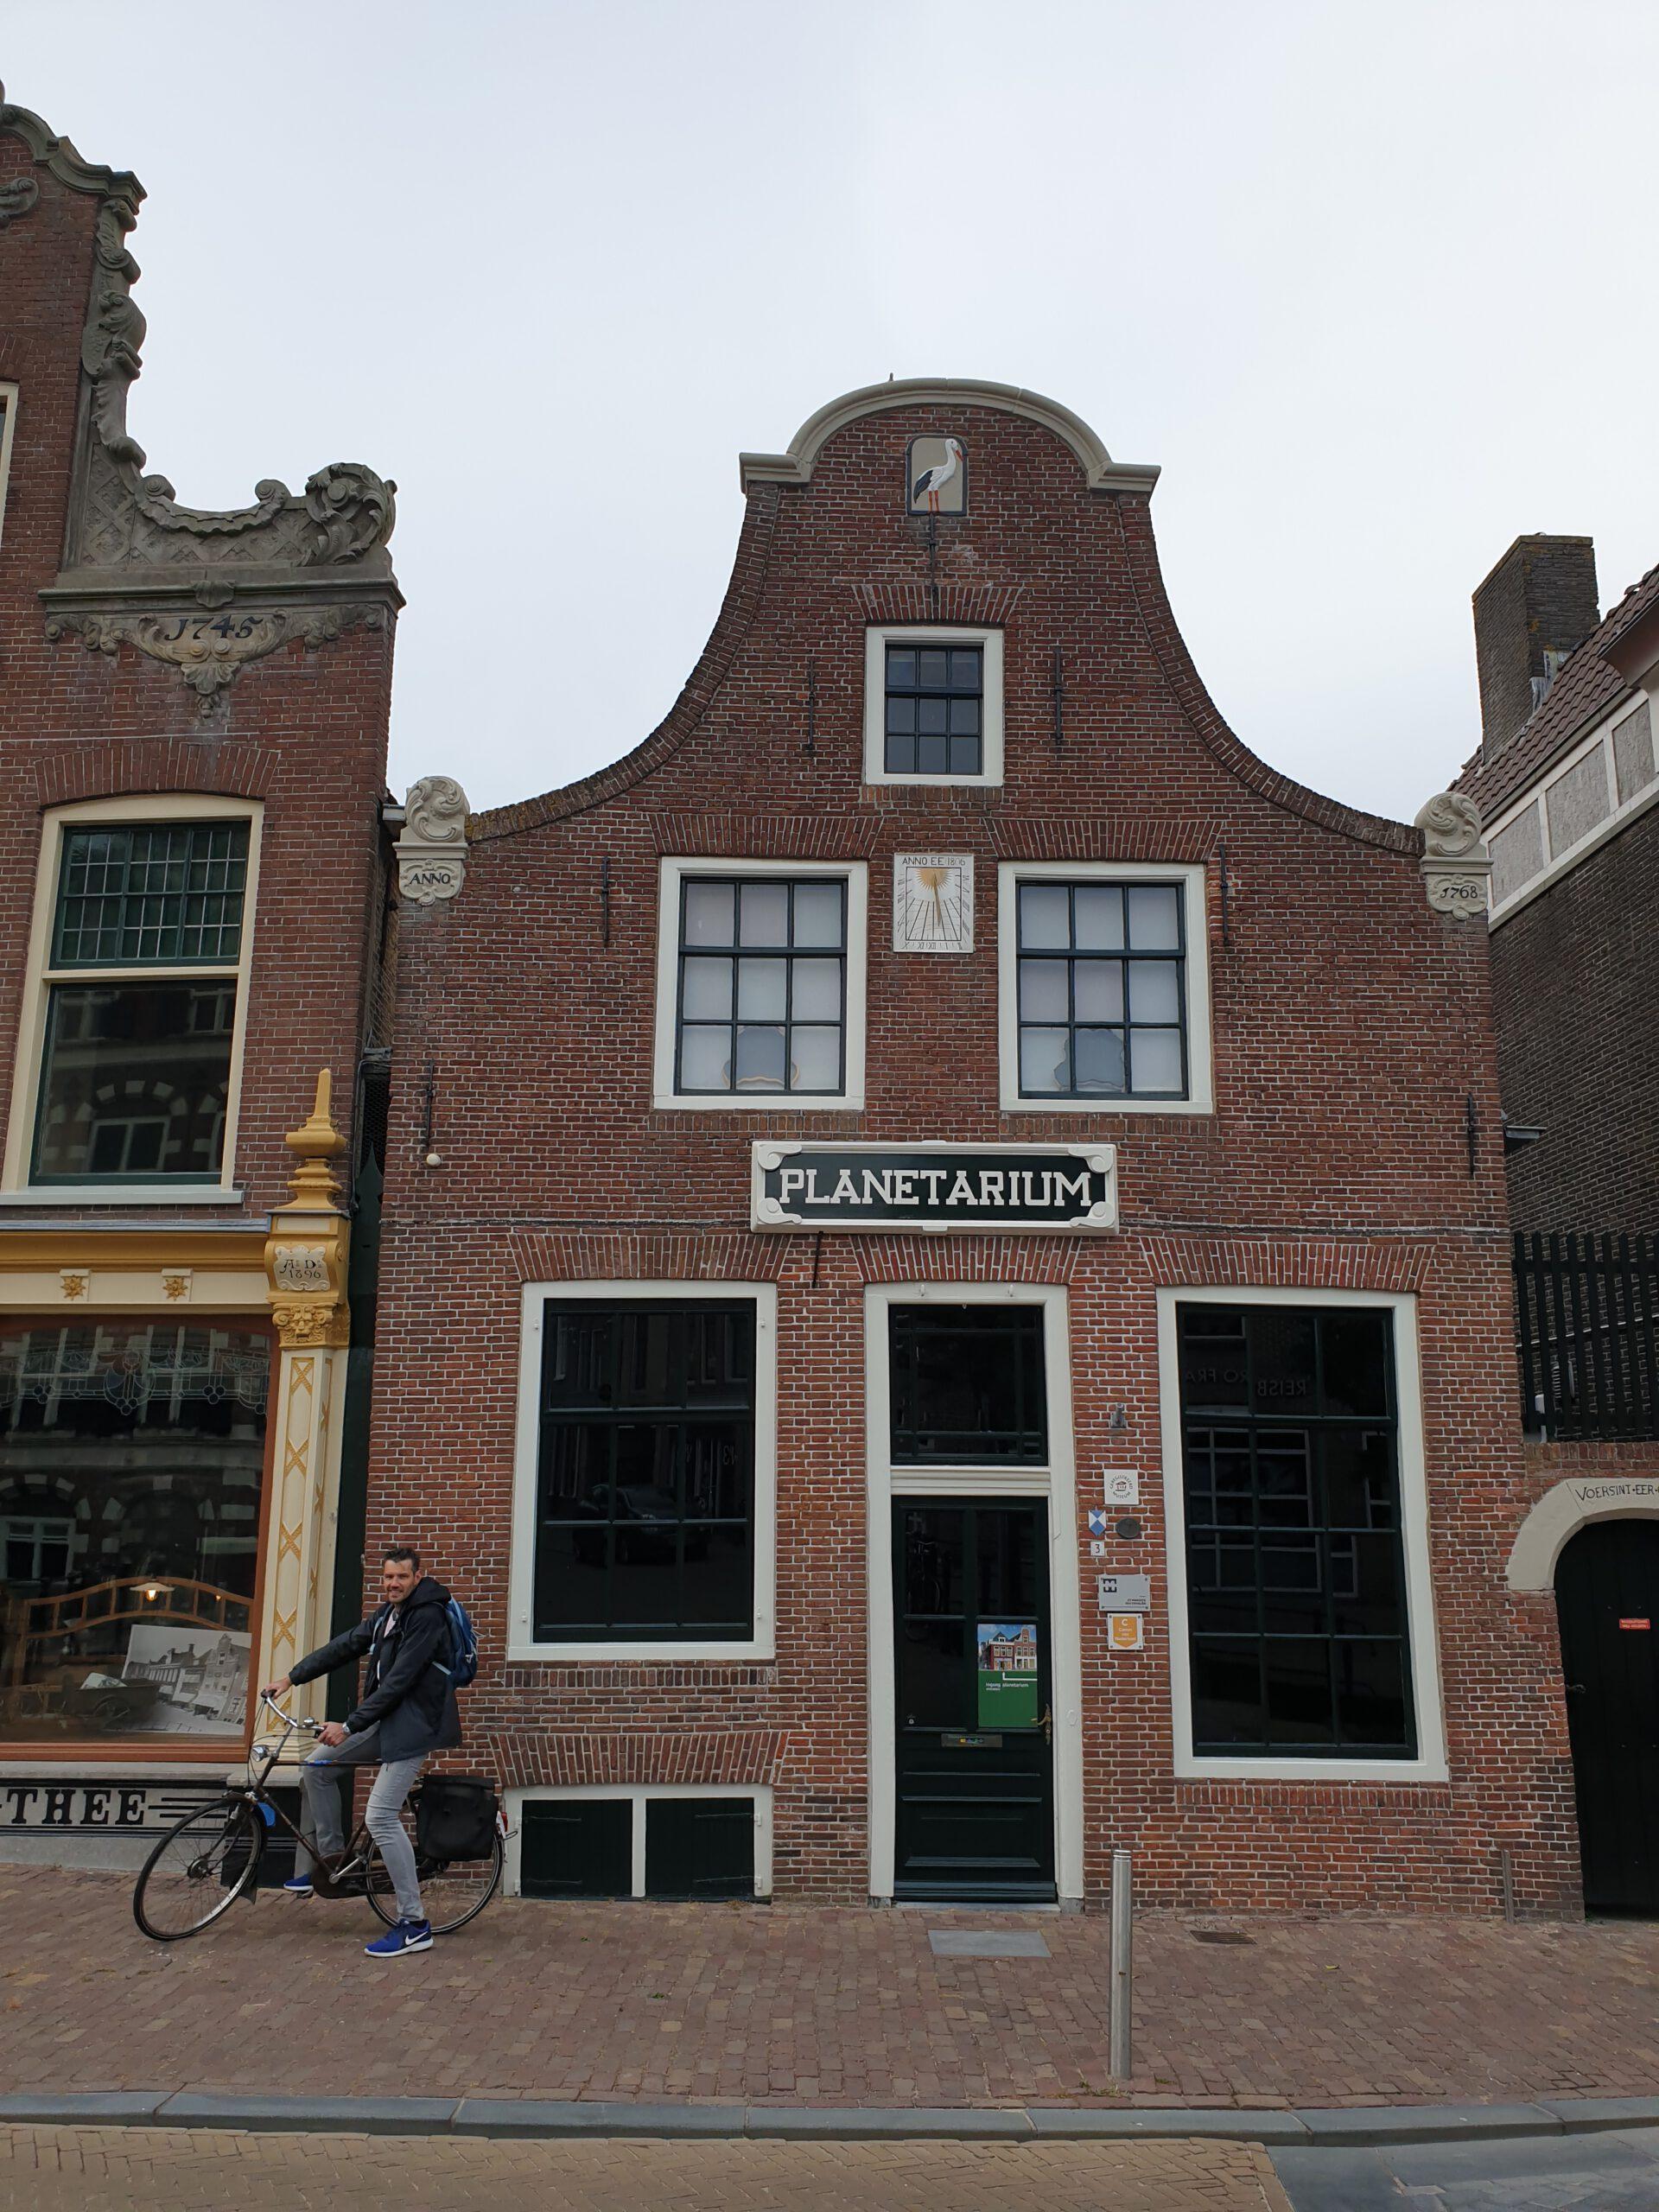 Vakantie in Friesland - Reisgelukjes - Eise Eisinga Planetarium